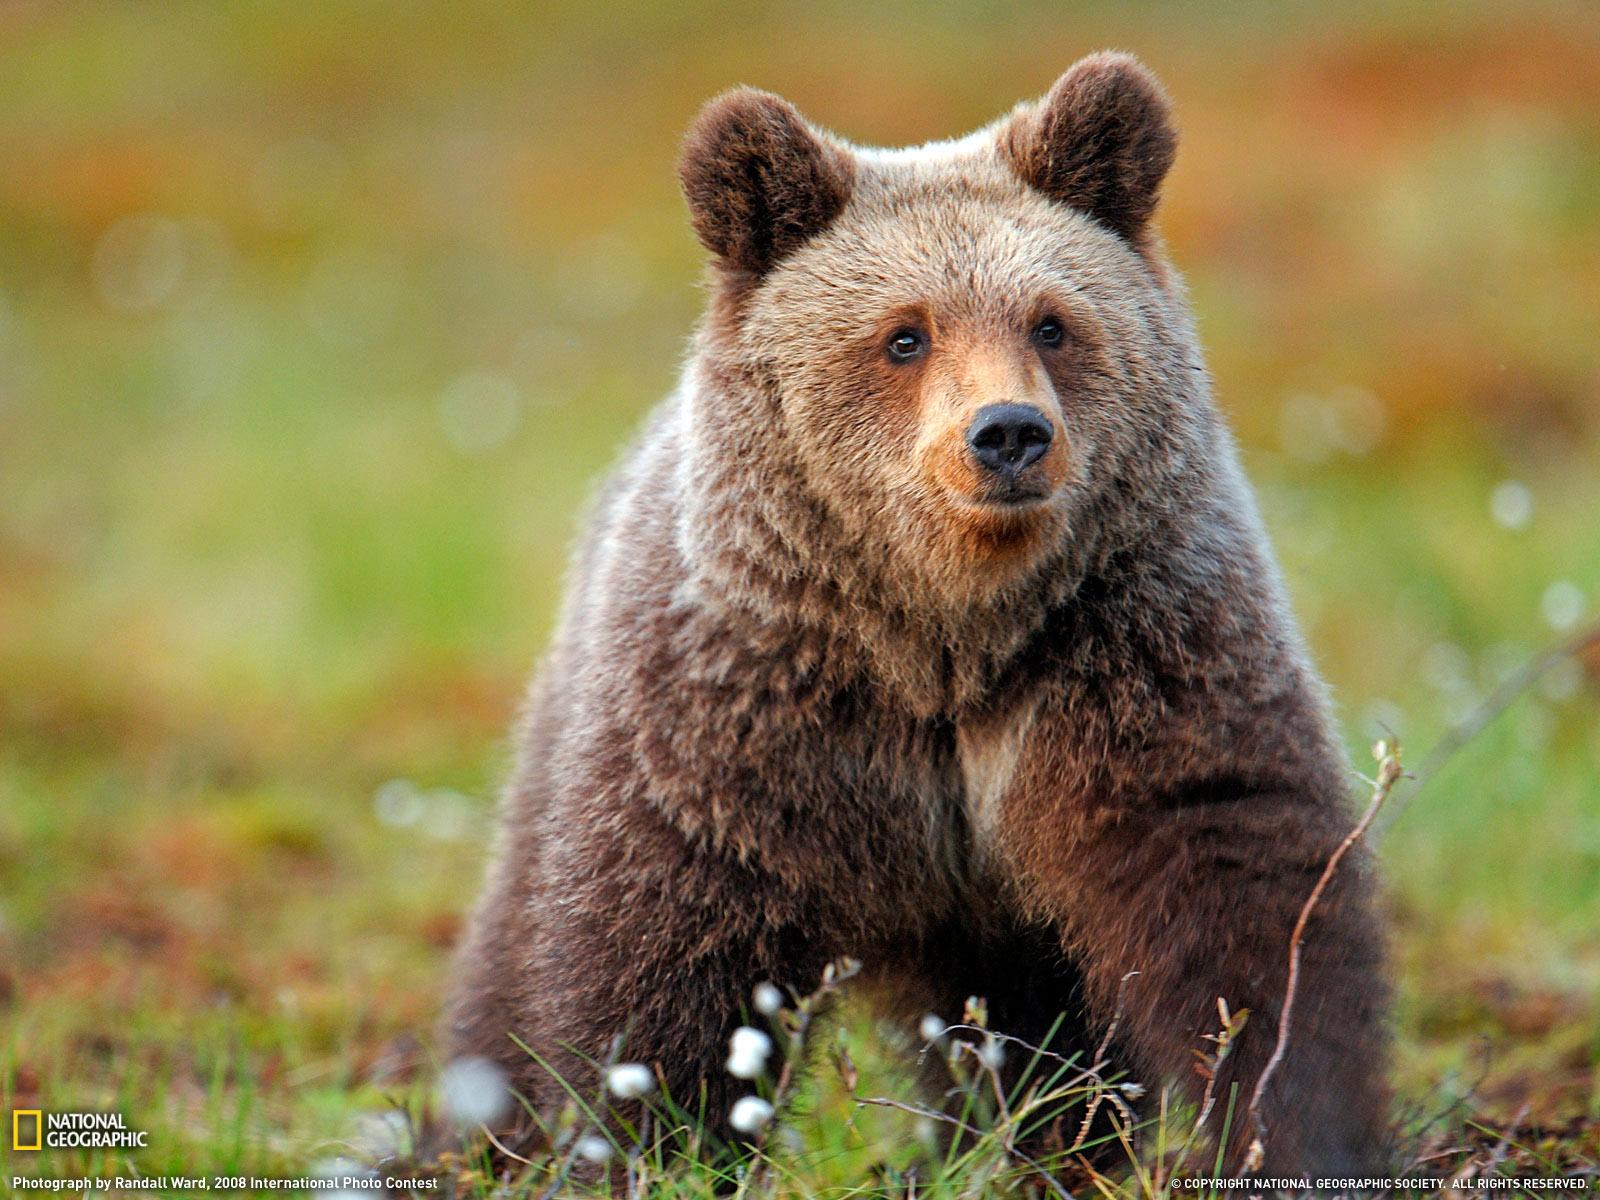 wild animals file size 436312 bytes dimensions 1600 x 1200 pixels wild 1600x1200